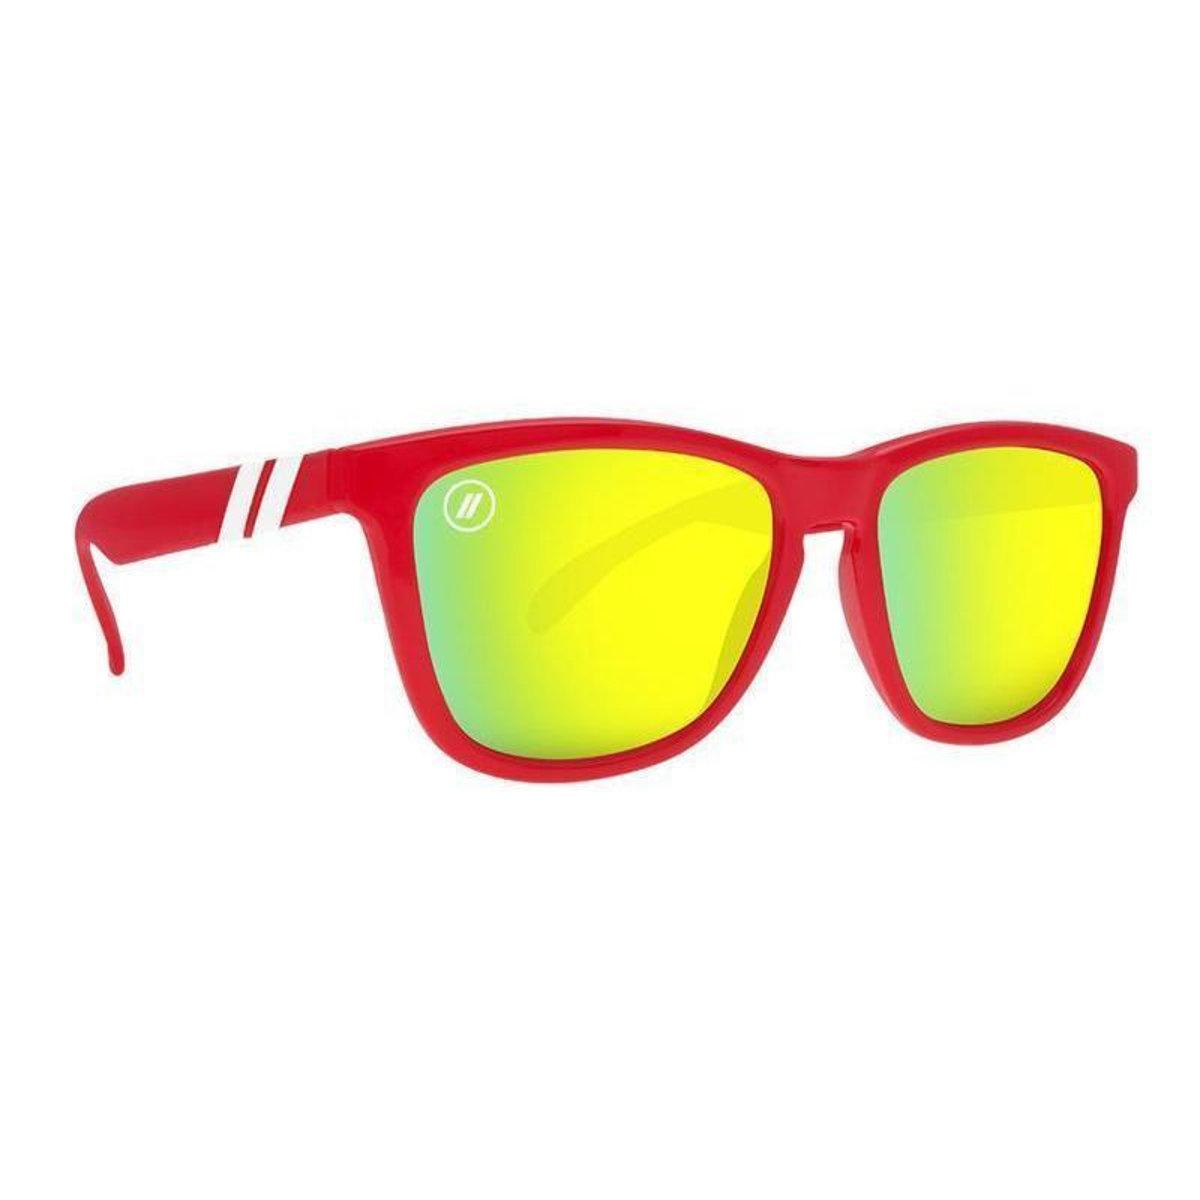 K Series // 紅色梯形鏡框太陽眼鏡